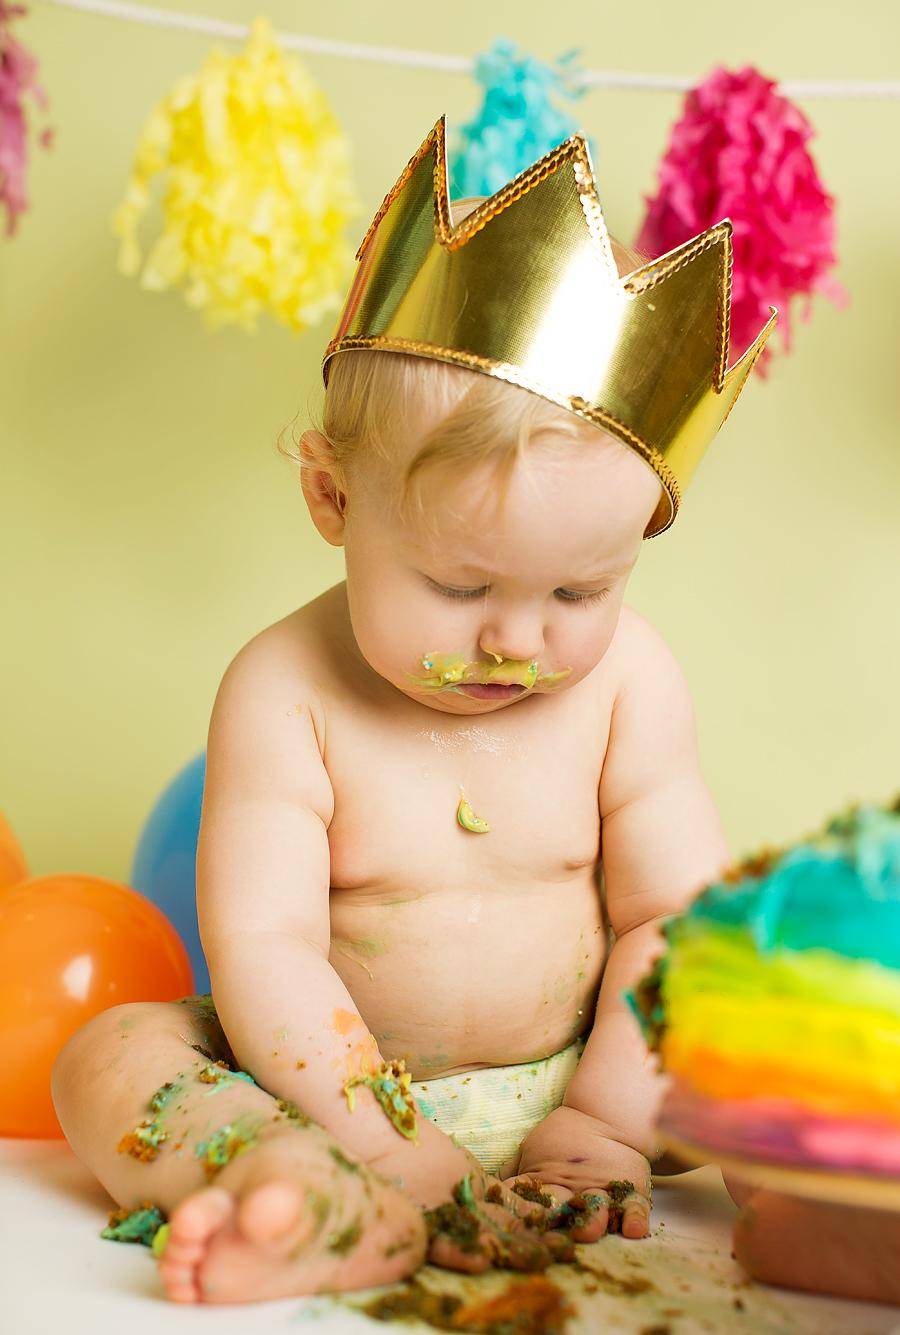 cakesmash-haslien-baby-fotograf-1-år-gutt-babyboy-blogg-gravid-2015-barn-kake-feiring-sarpsborg-cacas-regnbuekake-loan-emanuel_16